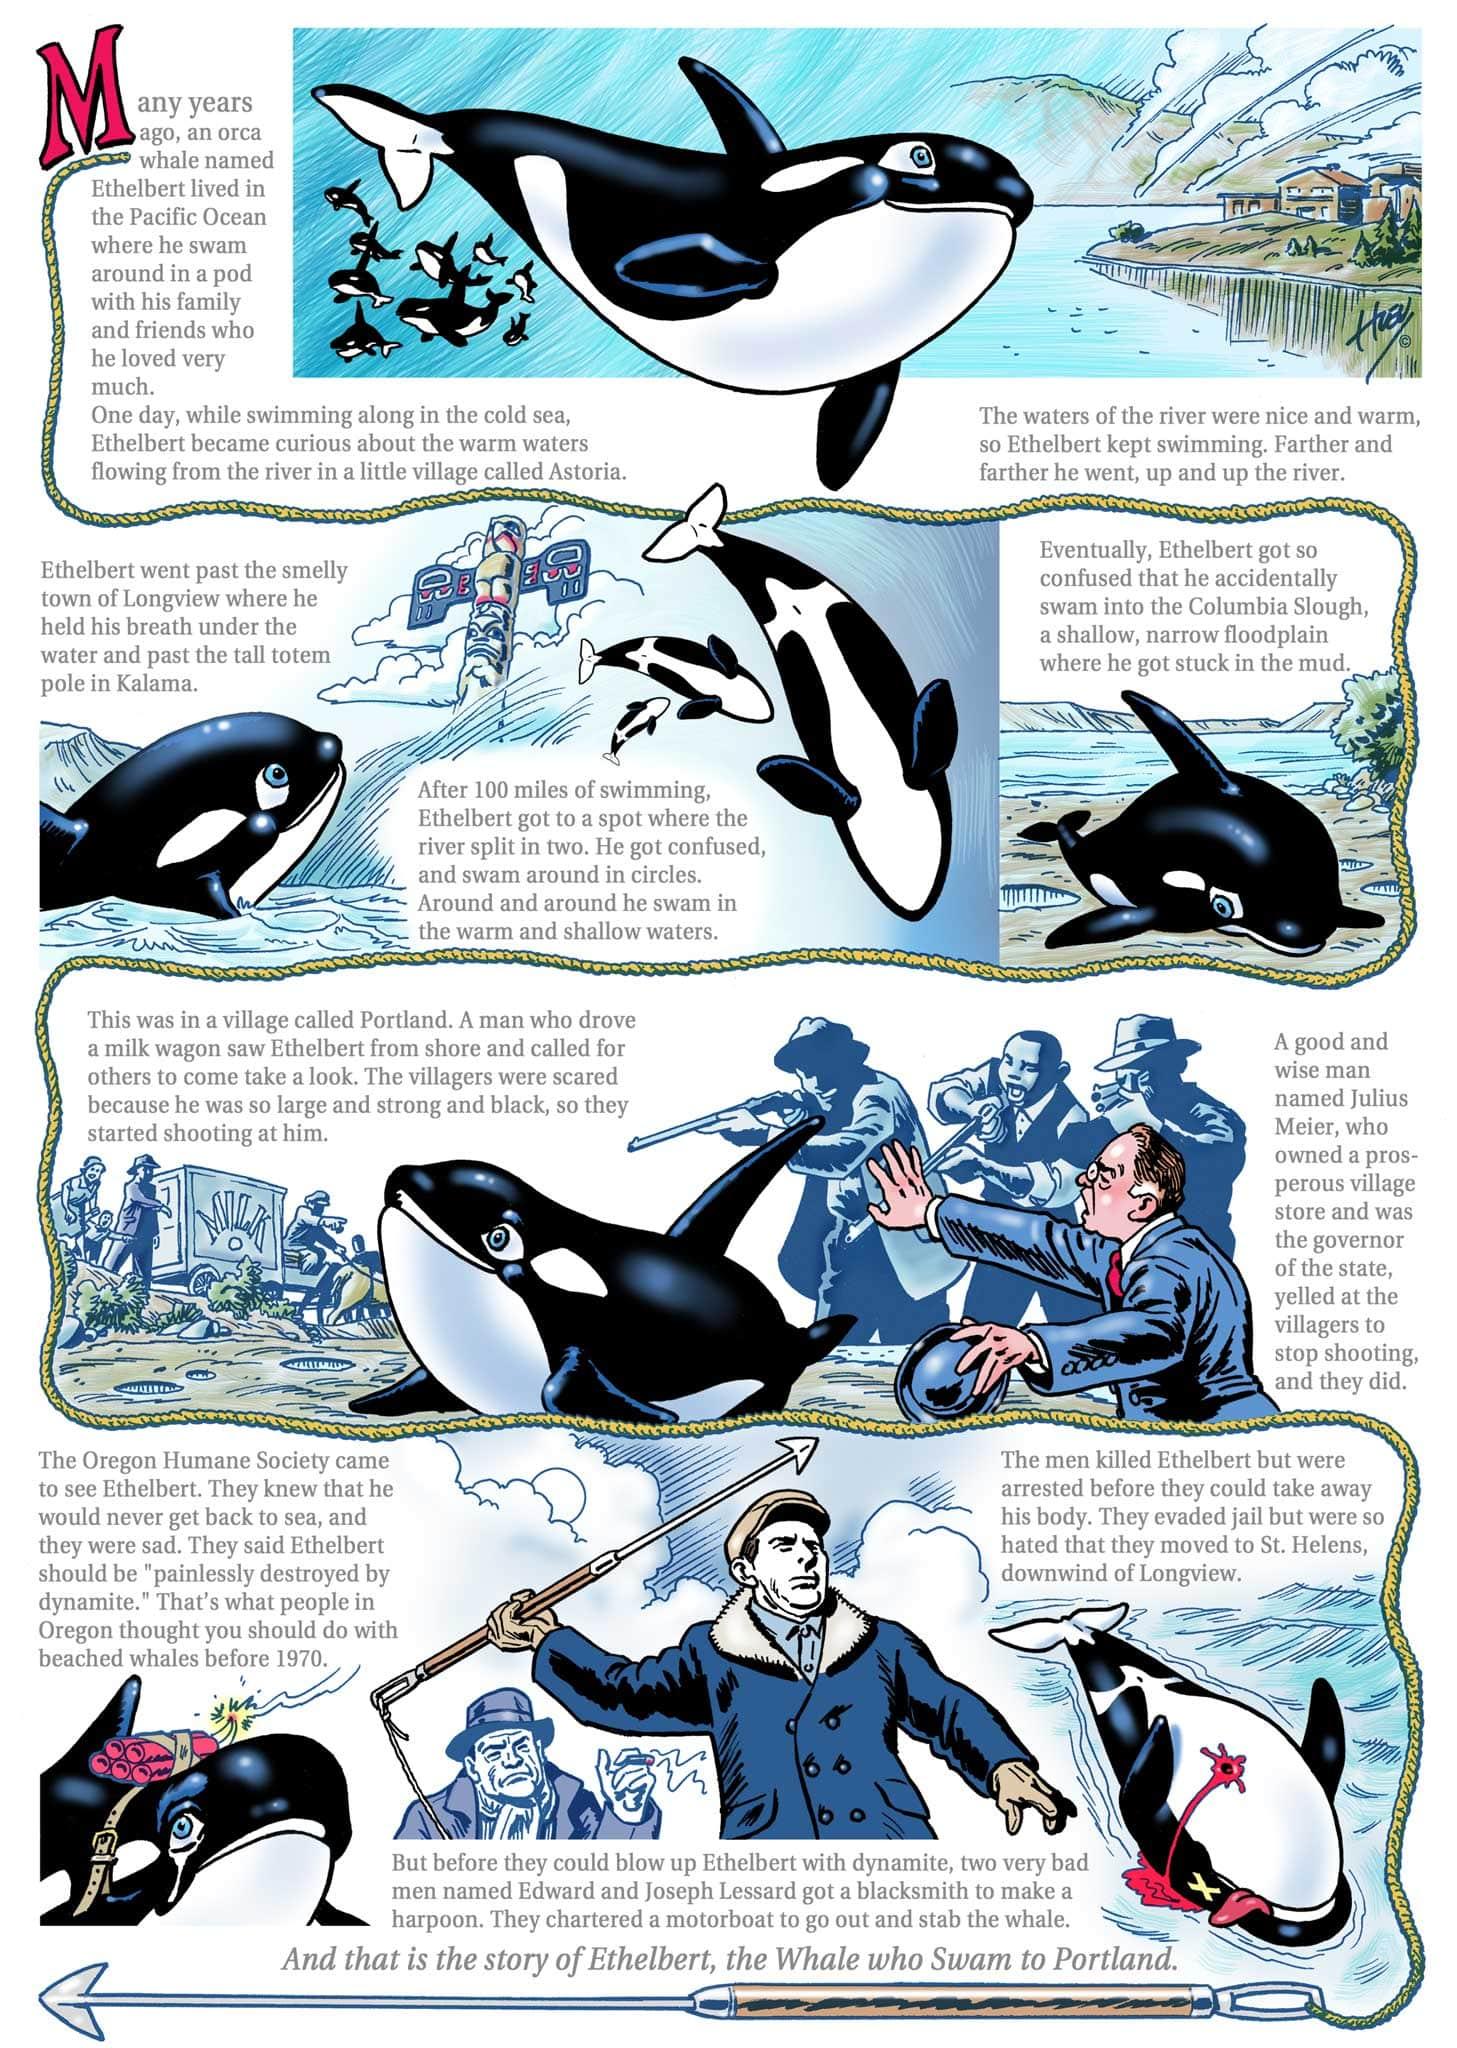 KH3412-ethelbert-orca-killer-whale